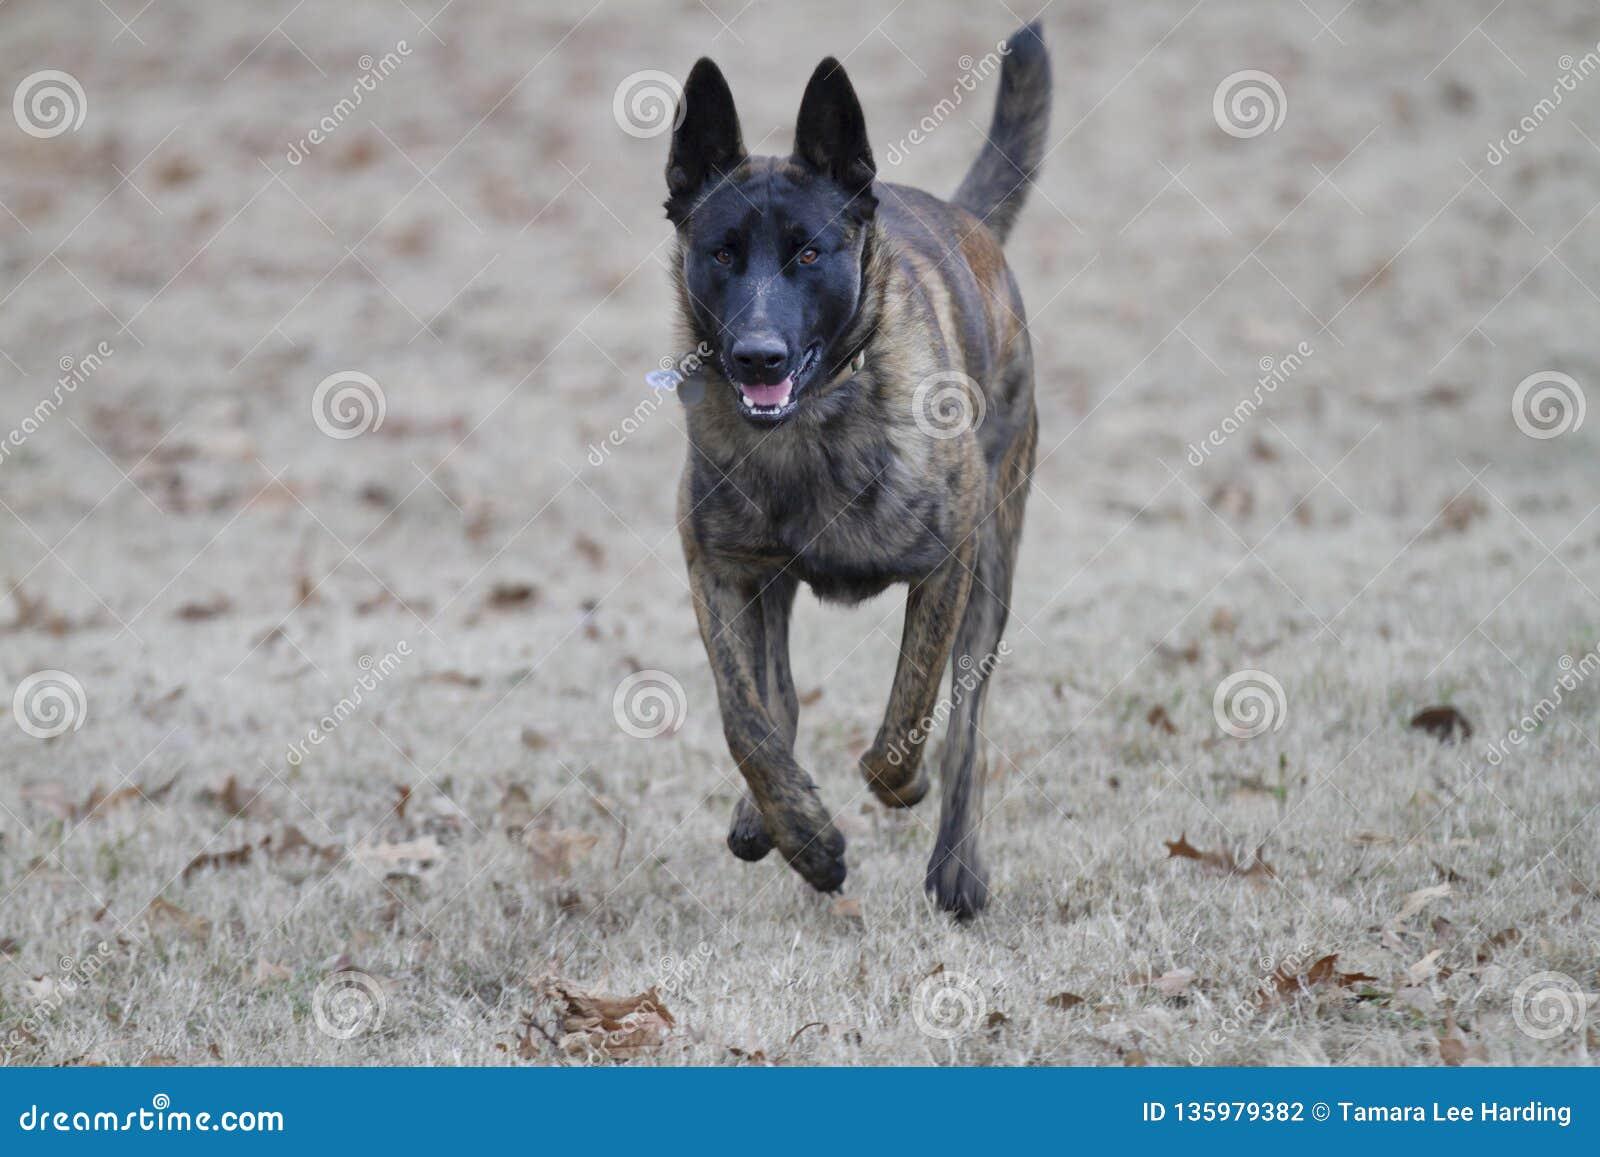 Dutch Shepherd Dog Or Belgian Malinois Dog Running Towards Viewer